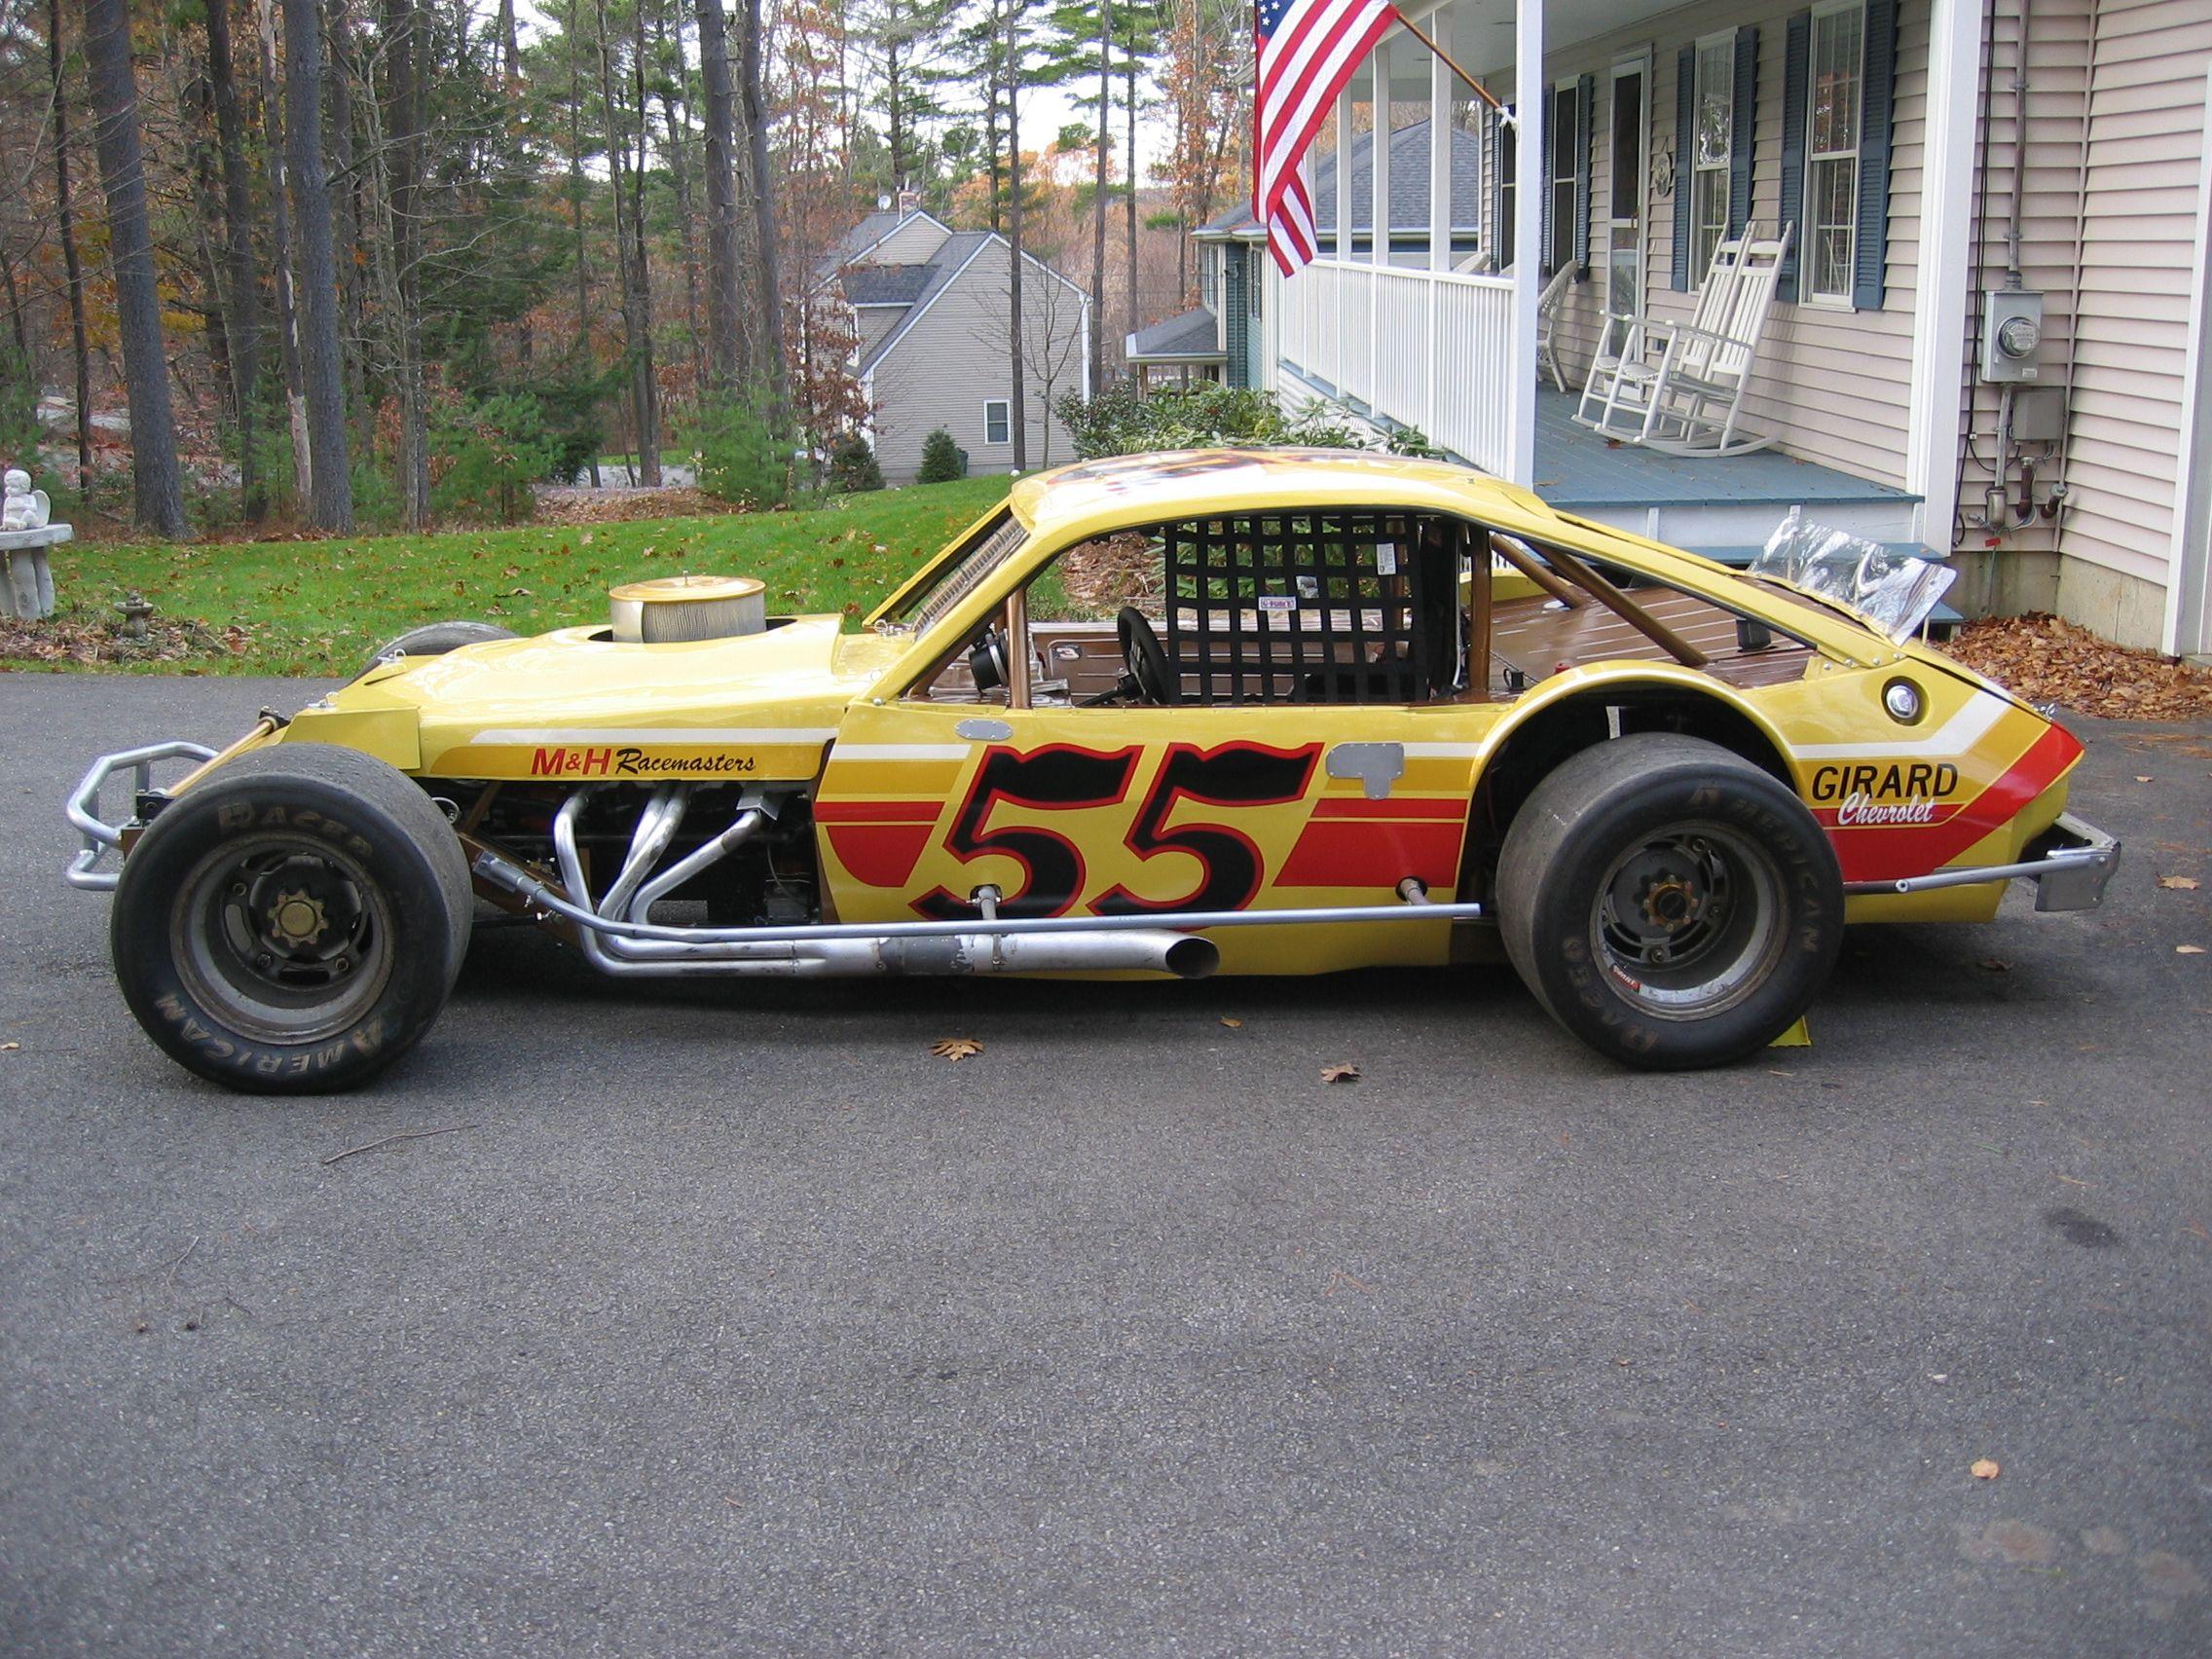 Http Www Bing Com Images Search Q Vintage Race Cars Vintage